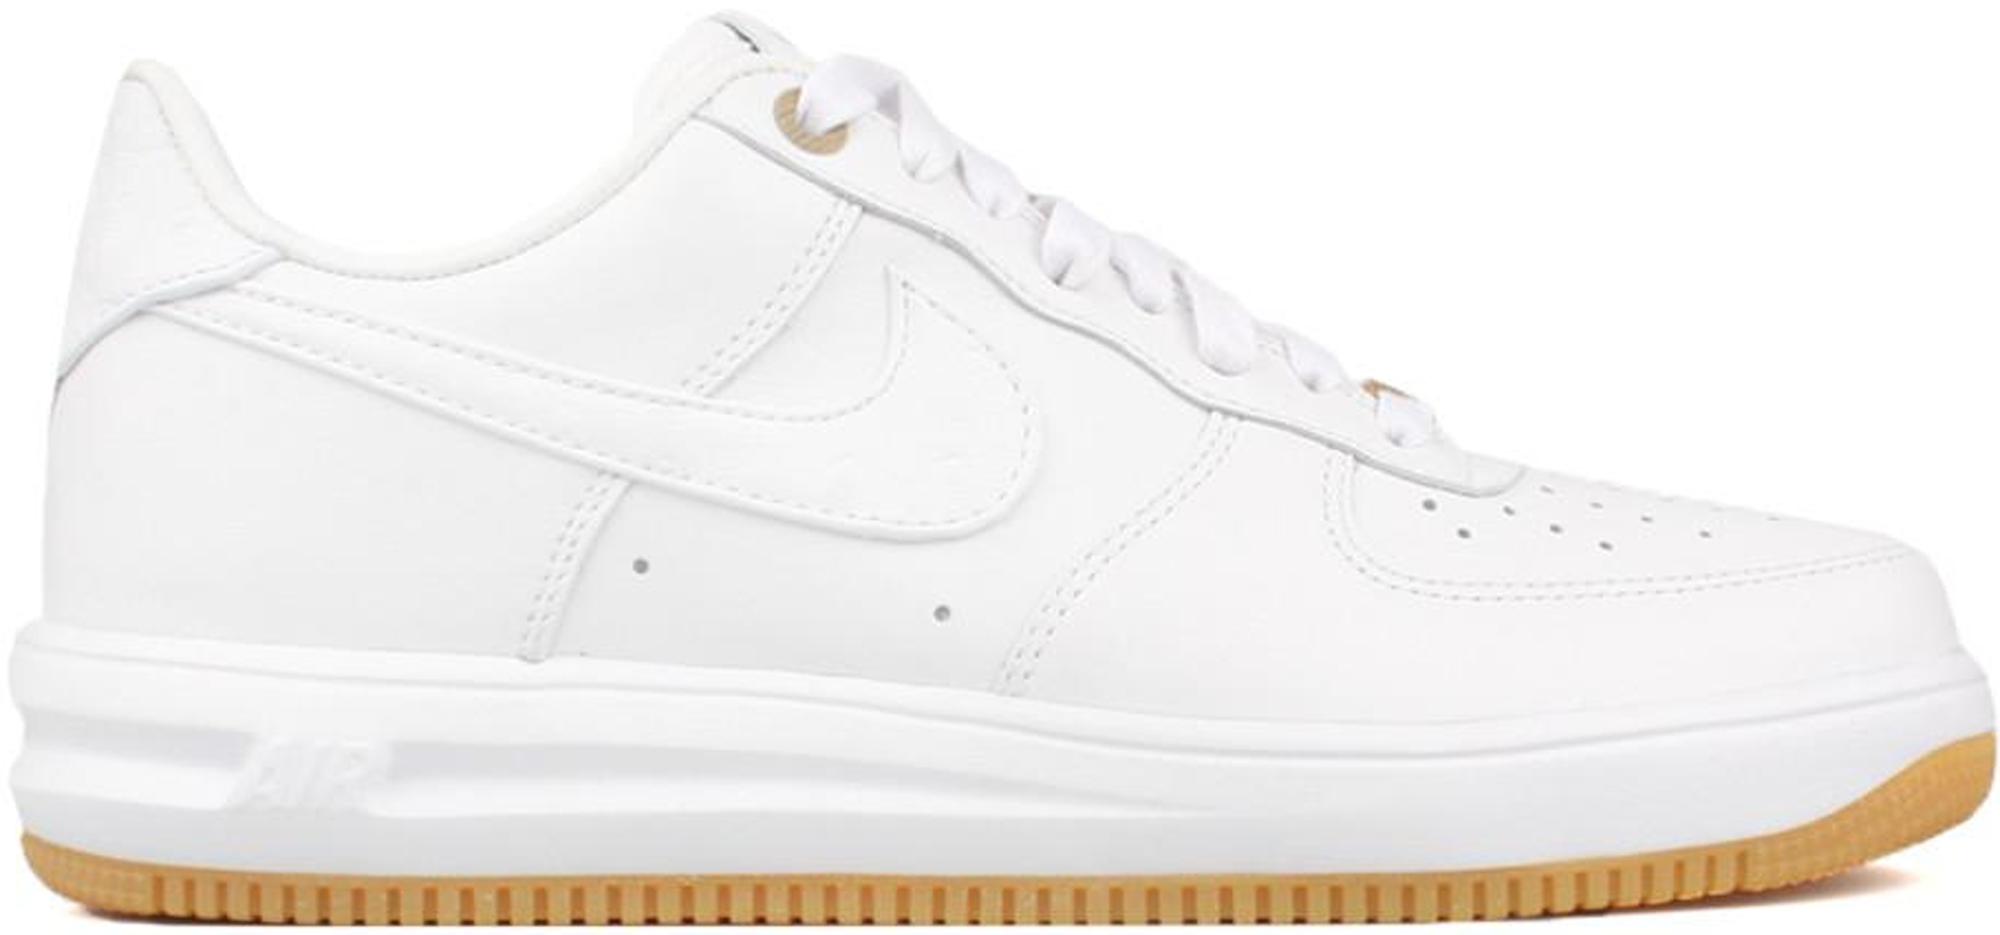 Nike Lunar Force 1 Low White Gum